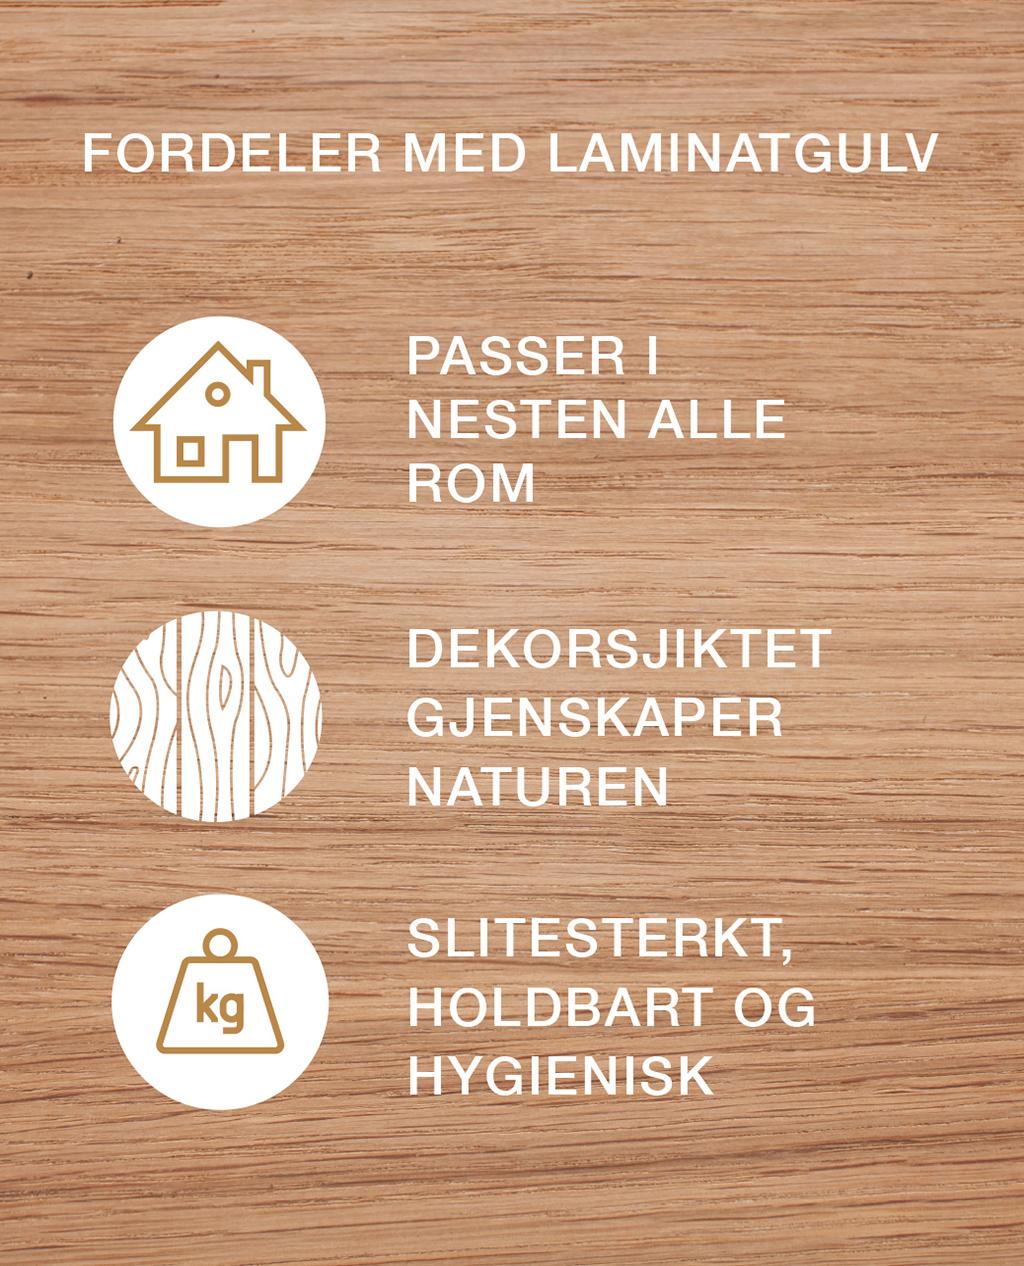 Pergo-infographic-fordeler-med-laminatgulv